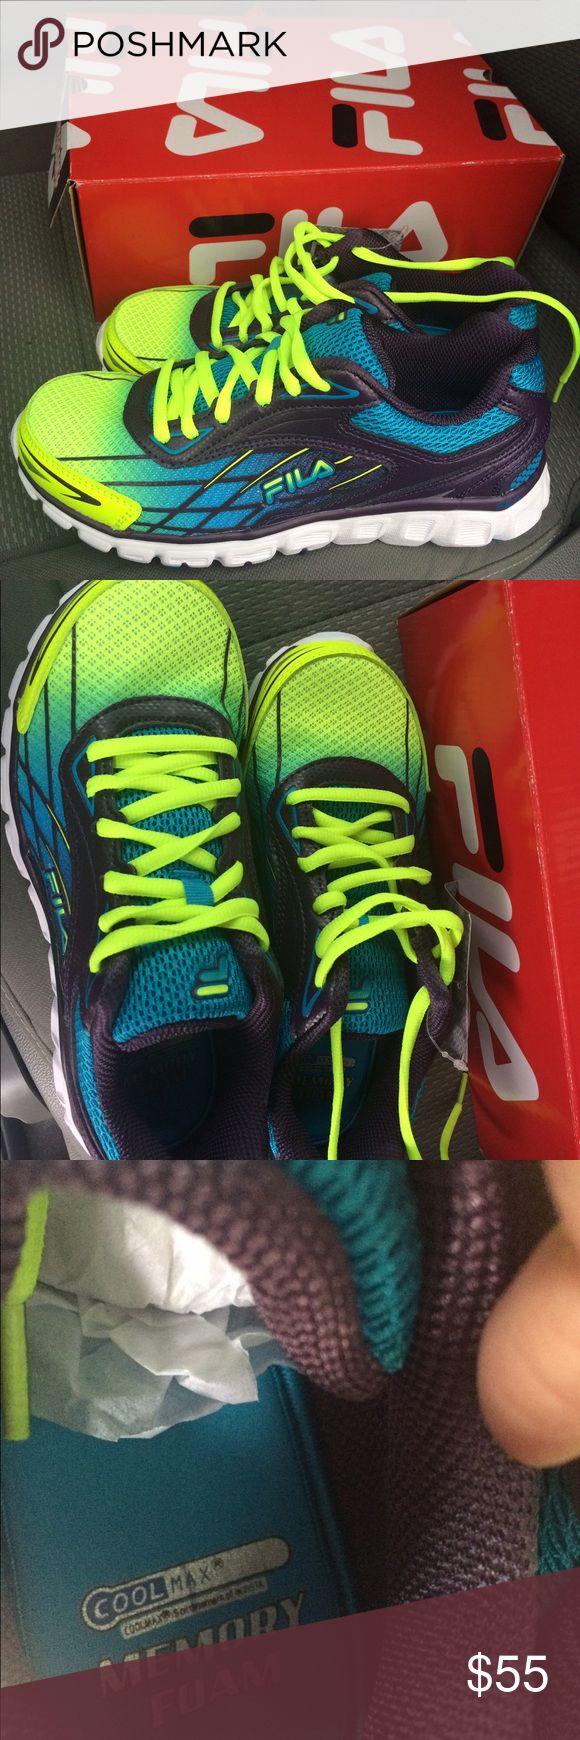 FilA Cool Max Memory Foam Sneakers blue/multi New in box. Size 6.5 Memory foam Fila Shoes Athletic Shoes